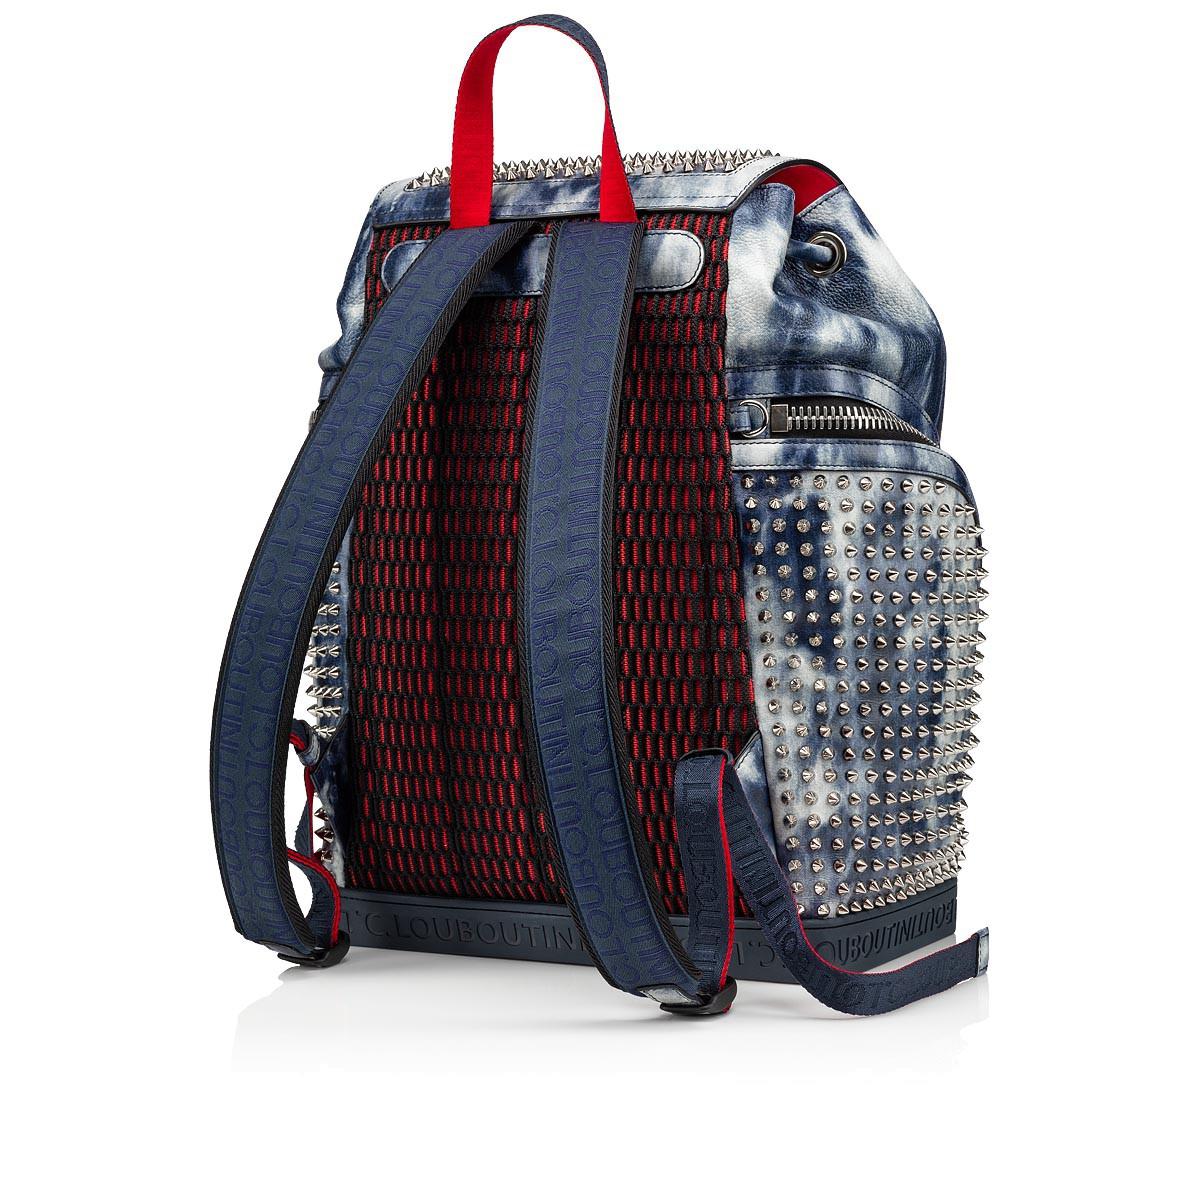 Bags - Explorafunk S Backpack - Christian Louboutin